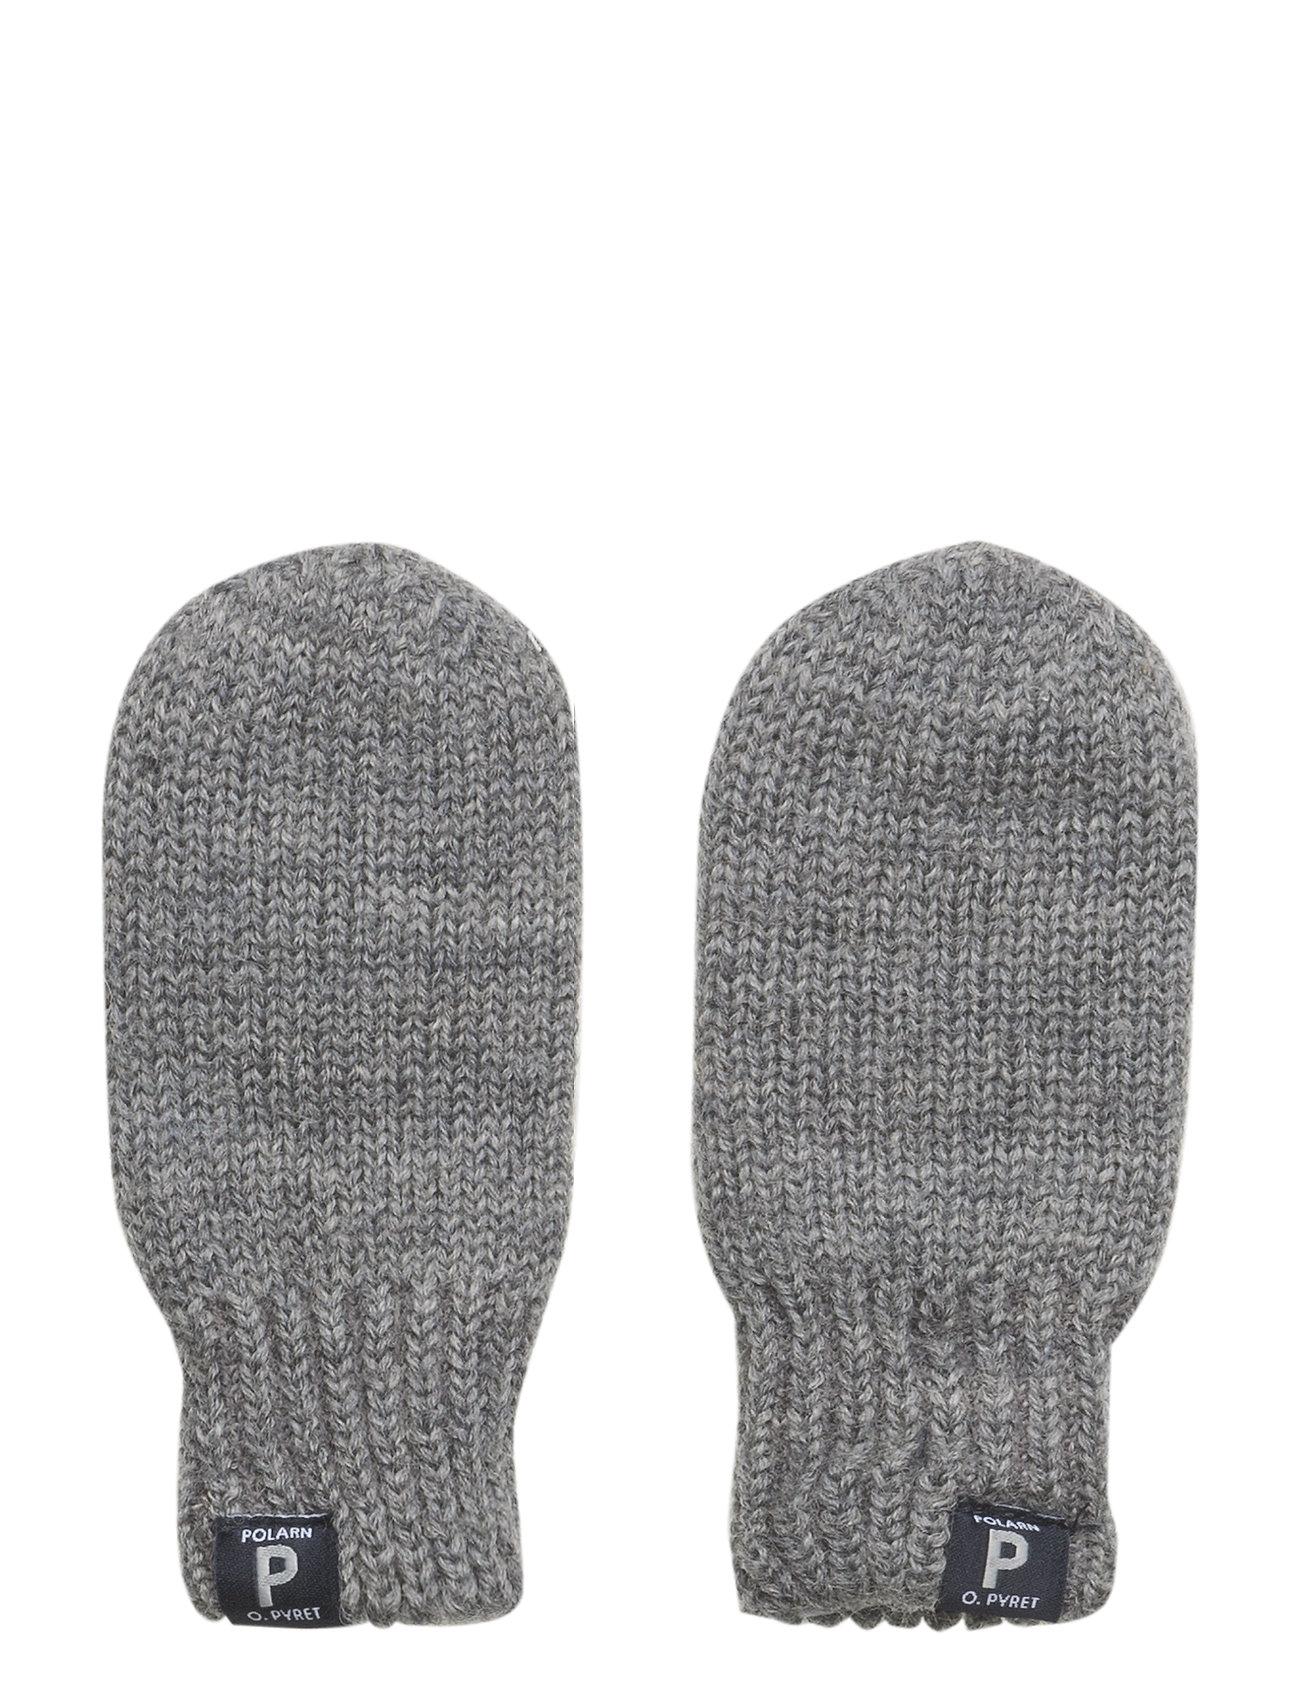 Polarn O. Pyret Mitten Wool Solid Newborn - GREYMELANGE